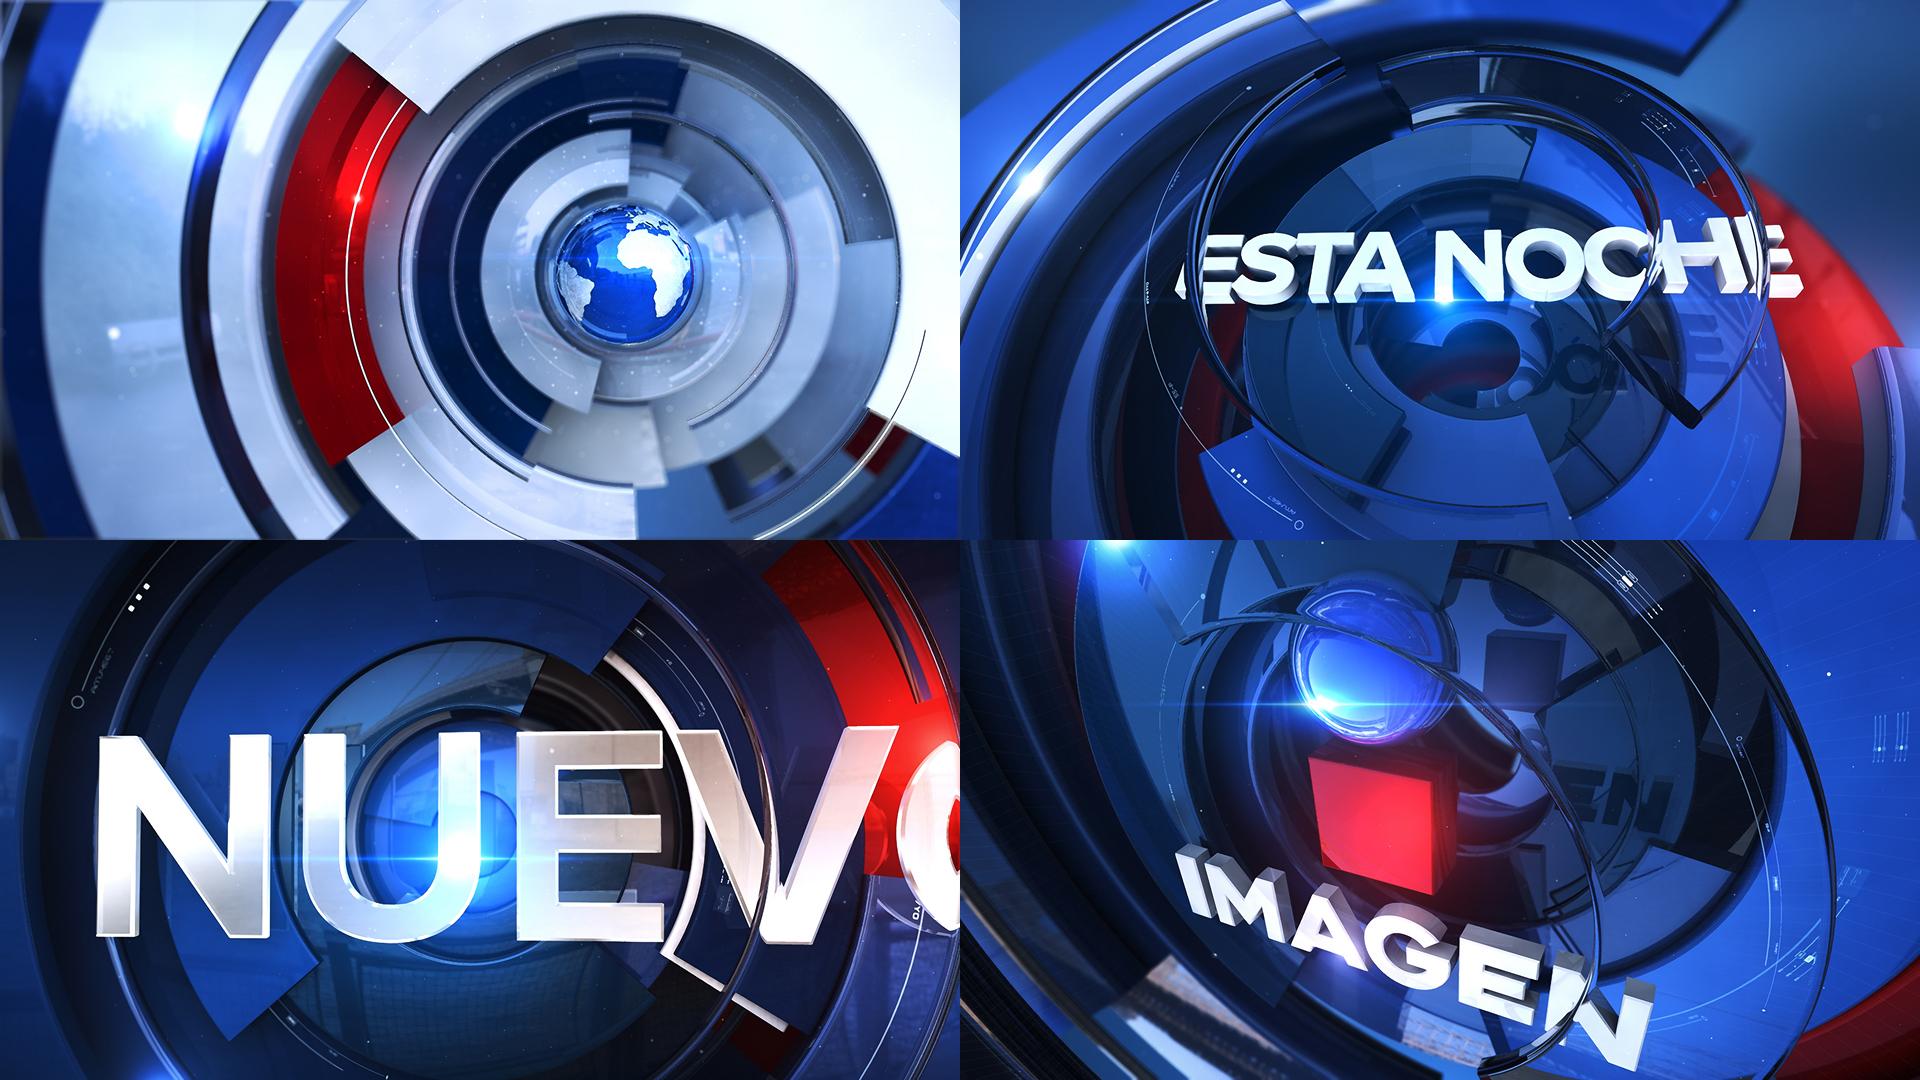 broadcast_design_grupo_imagen_mexico_news_titles_renderon_06.jpg